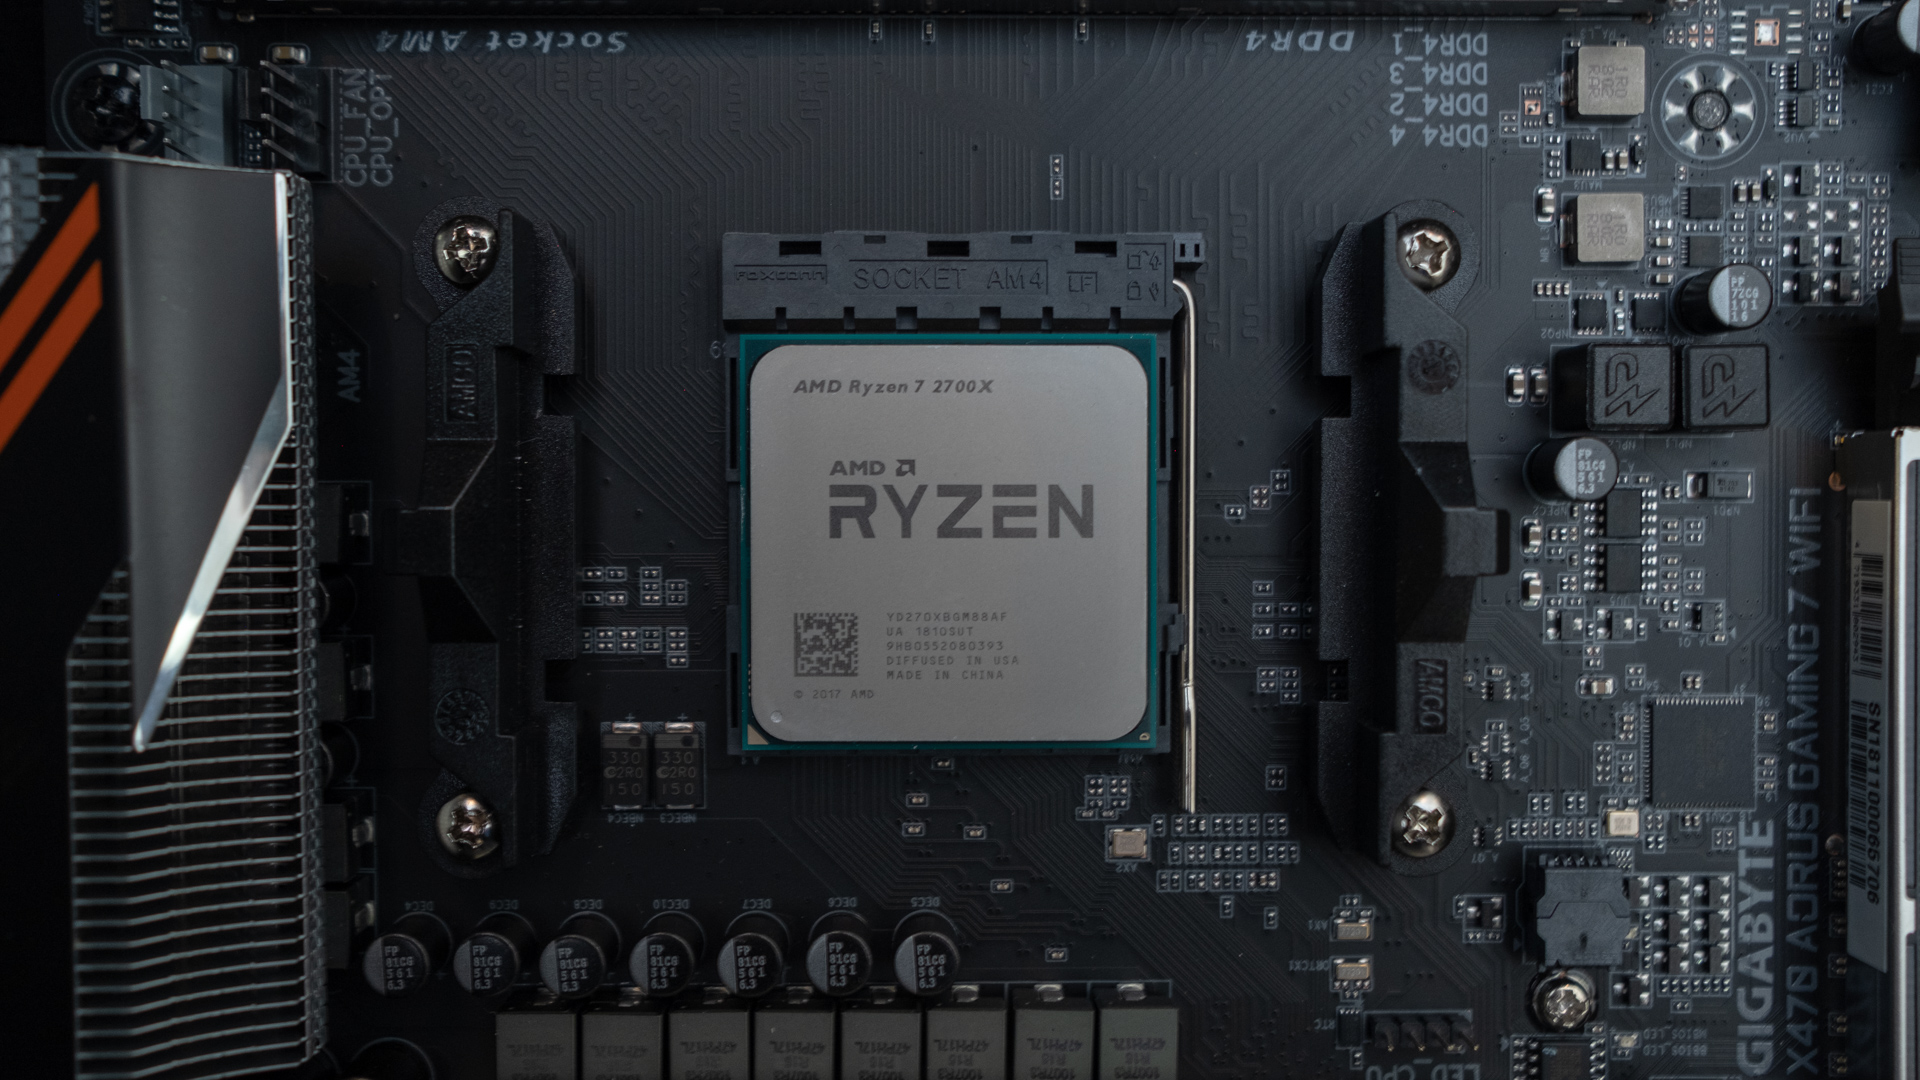 Amd Ryzen 7 2700x Review Amd Ryzen 7 2700 1920x1080 Wallpaper Teahub Io